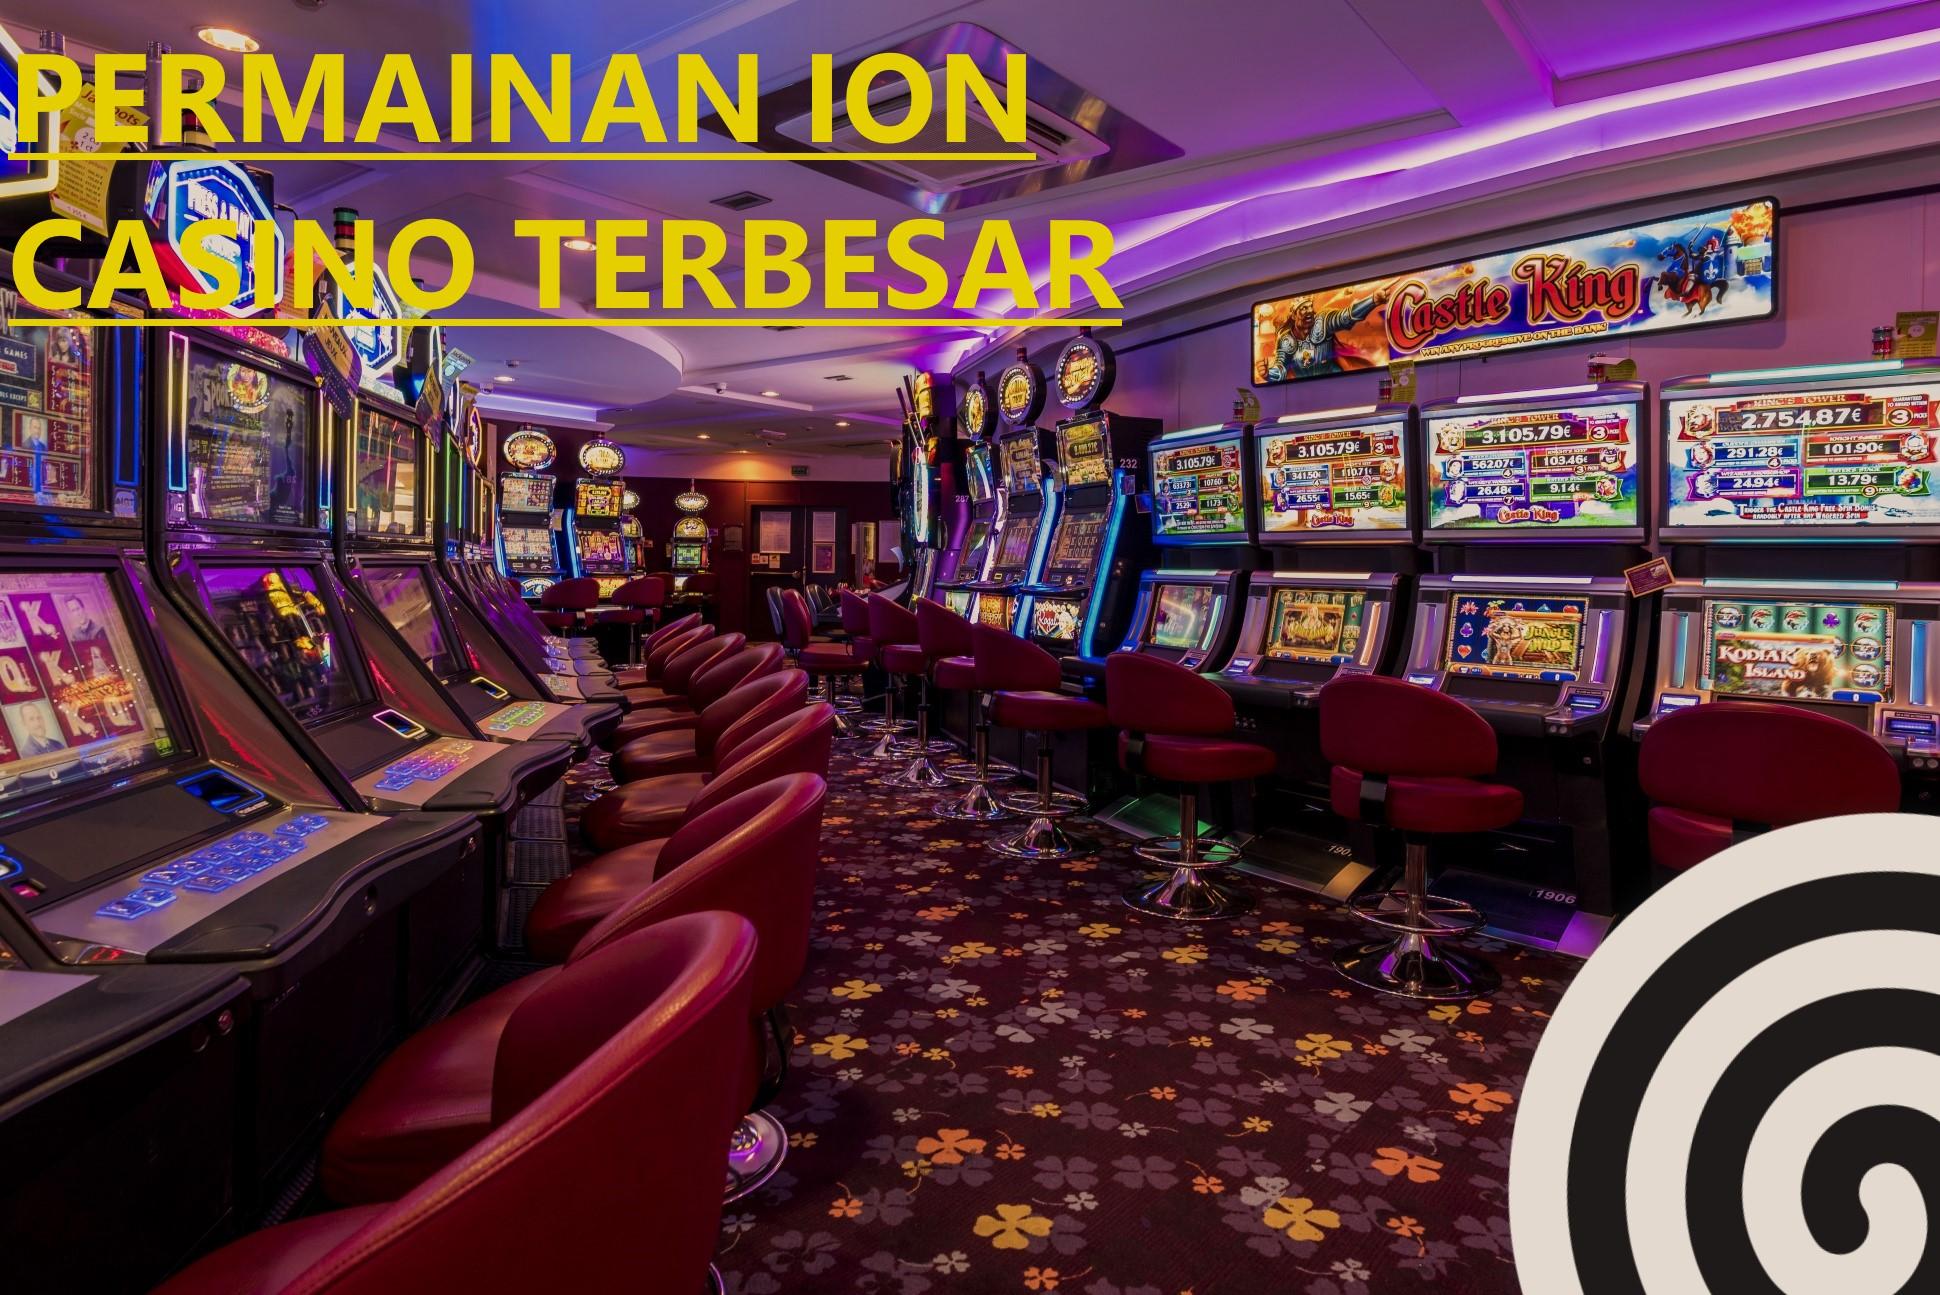 Inilah Awalan Terbaik Sebelum Kamu Memainkan Ion Casino Judi